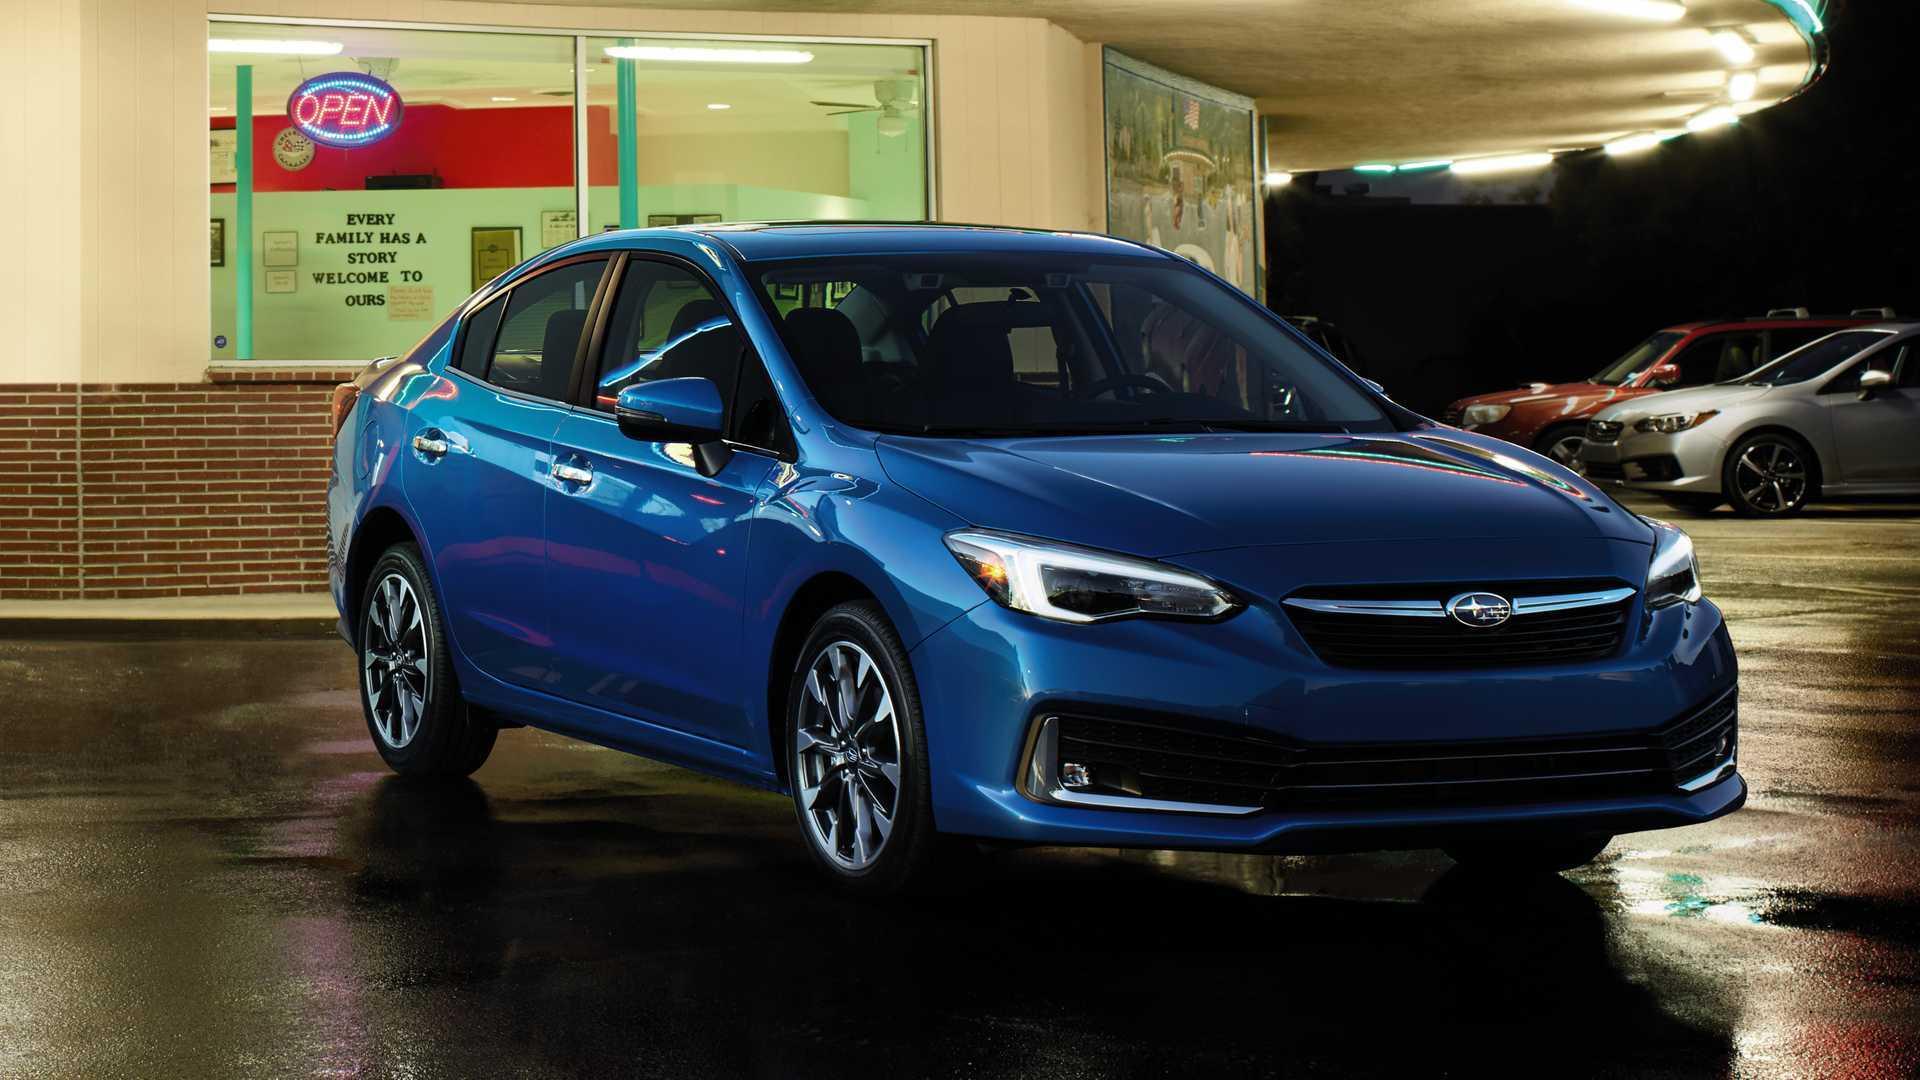 2020 Subaru Impreza Hatchback Review.2020 Subaru Impreza Gets Massive 100 Base Model Price